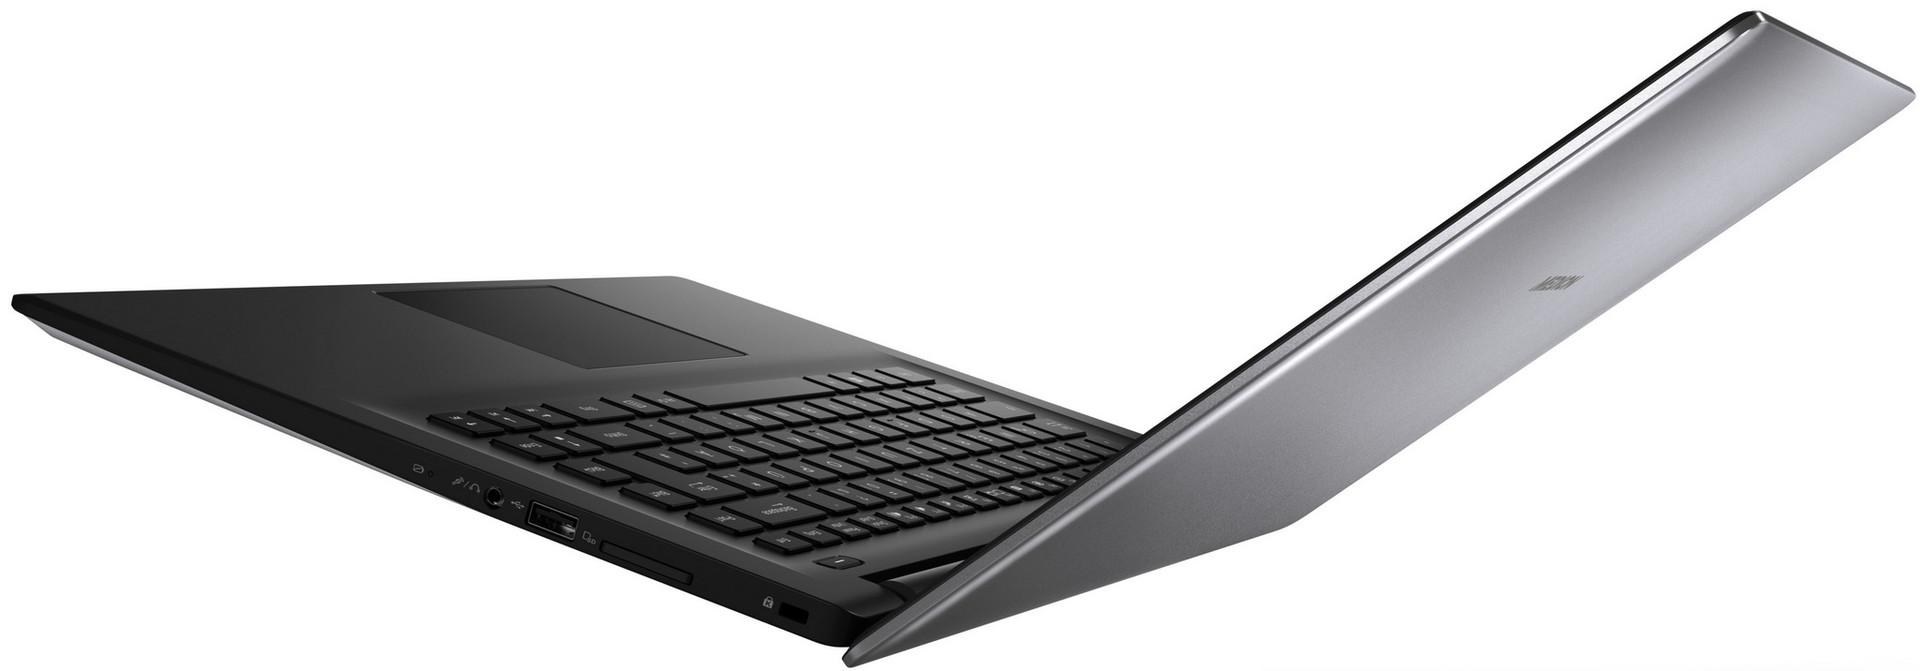 aldi verkauft medion akoya e6246 15 6 zoll laptop f r 400. Black Bedroom Furniture Sets. Home Design Ideas